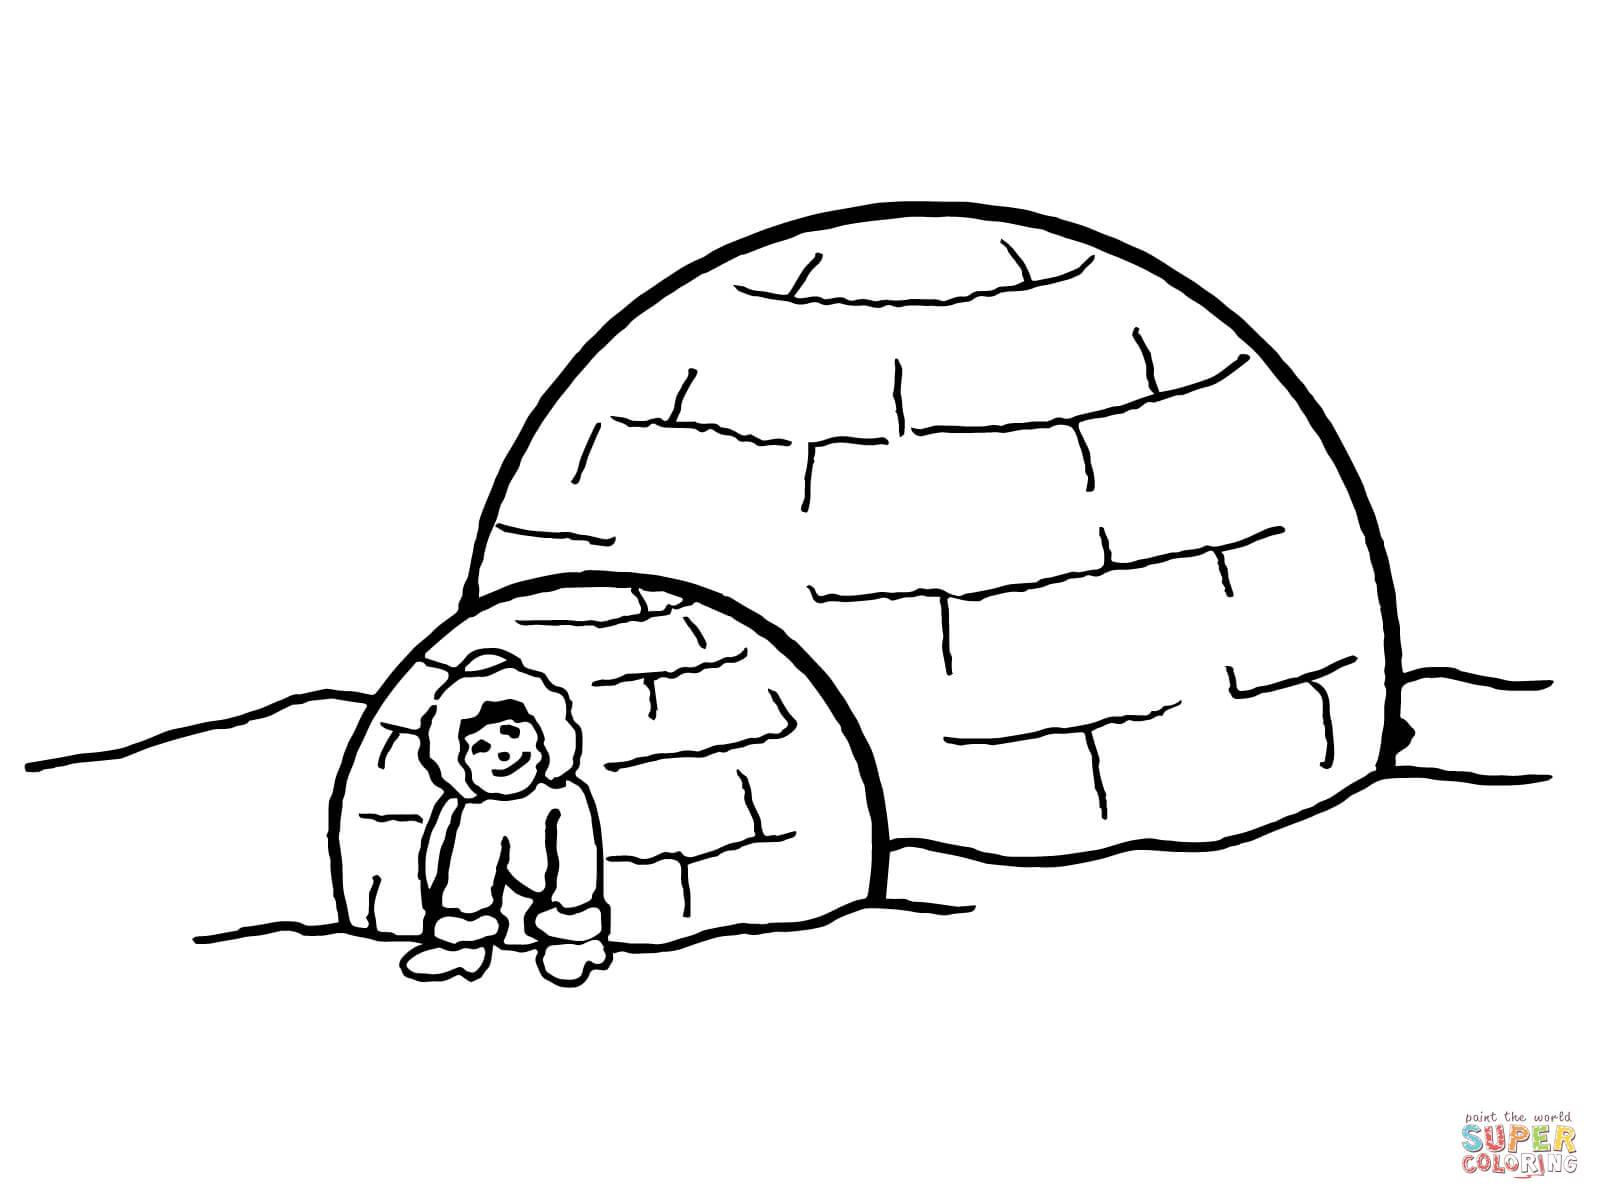 Coloriage - Igloo Inuit | Coloriages À Imprimer Gratuits concernant Coloriage Igloo